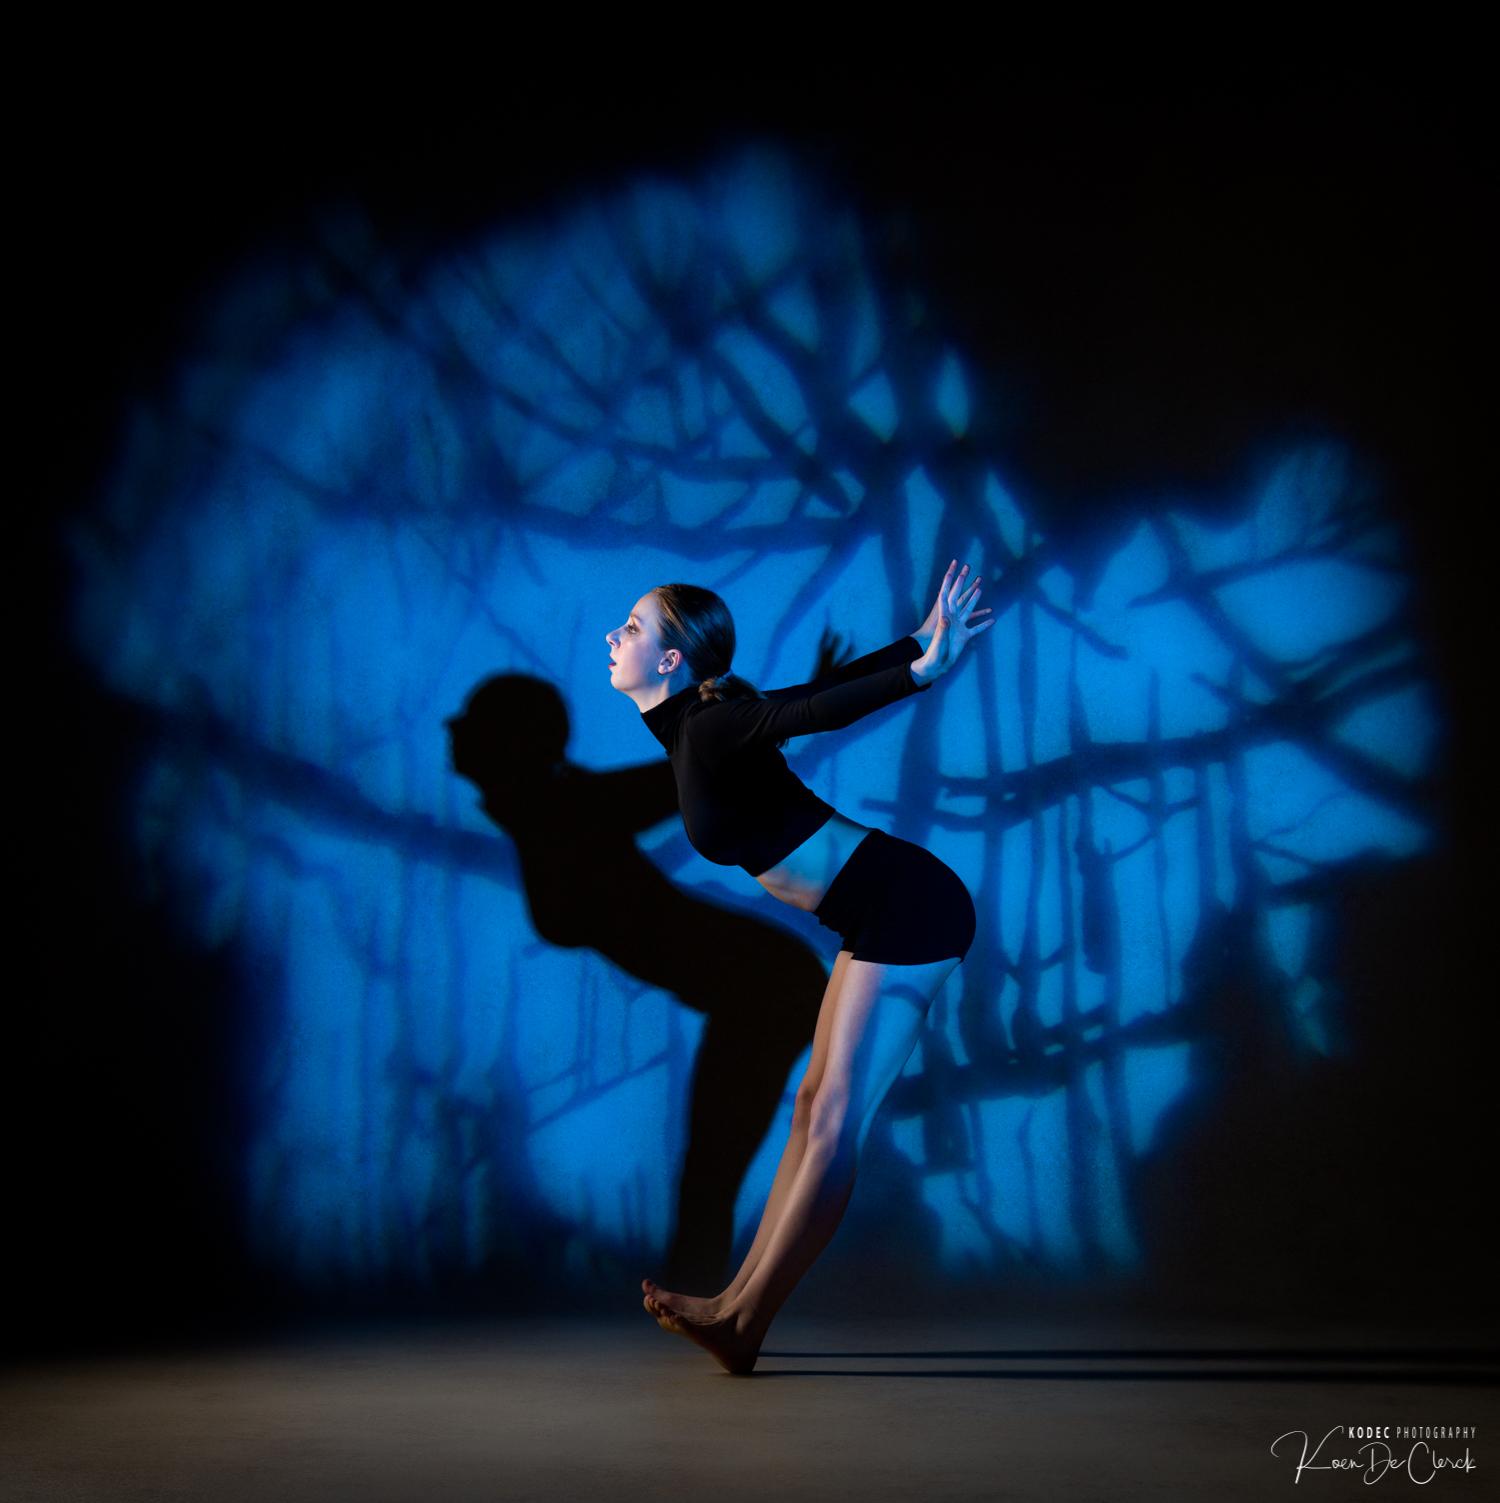 0523 Dance Shoot Kato Thomas.jpg